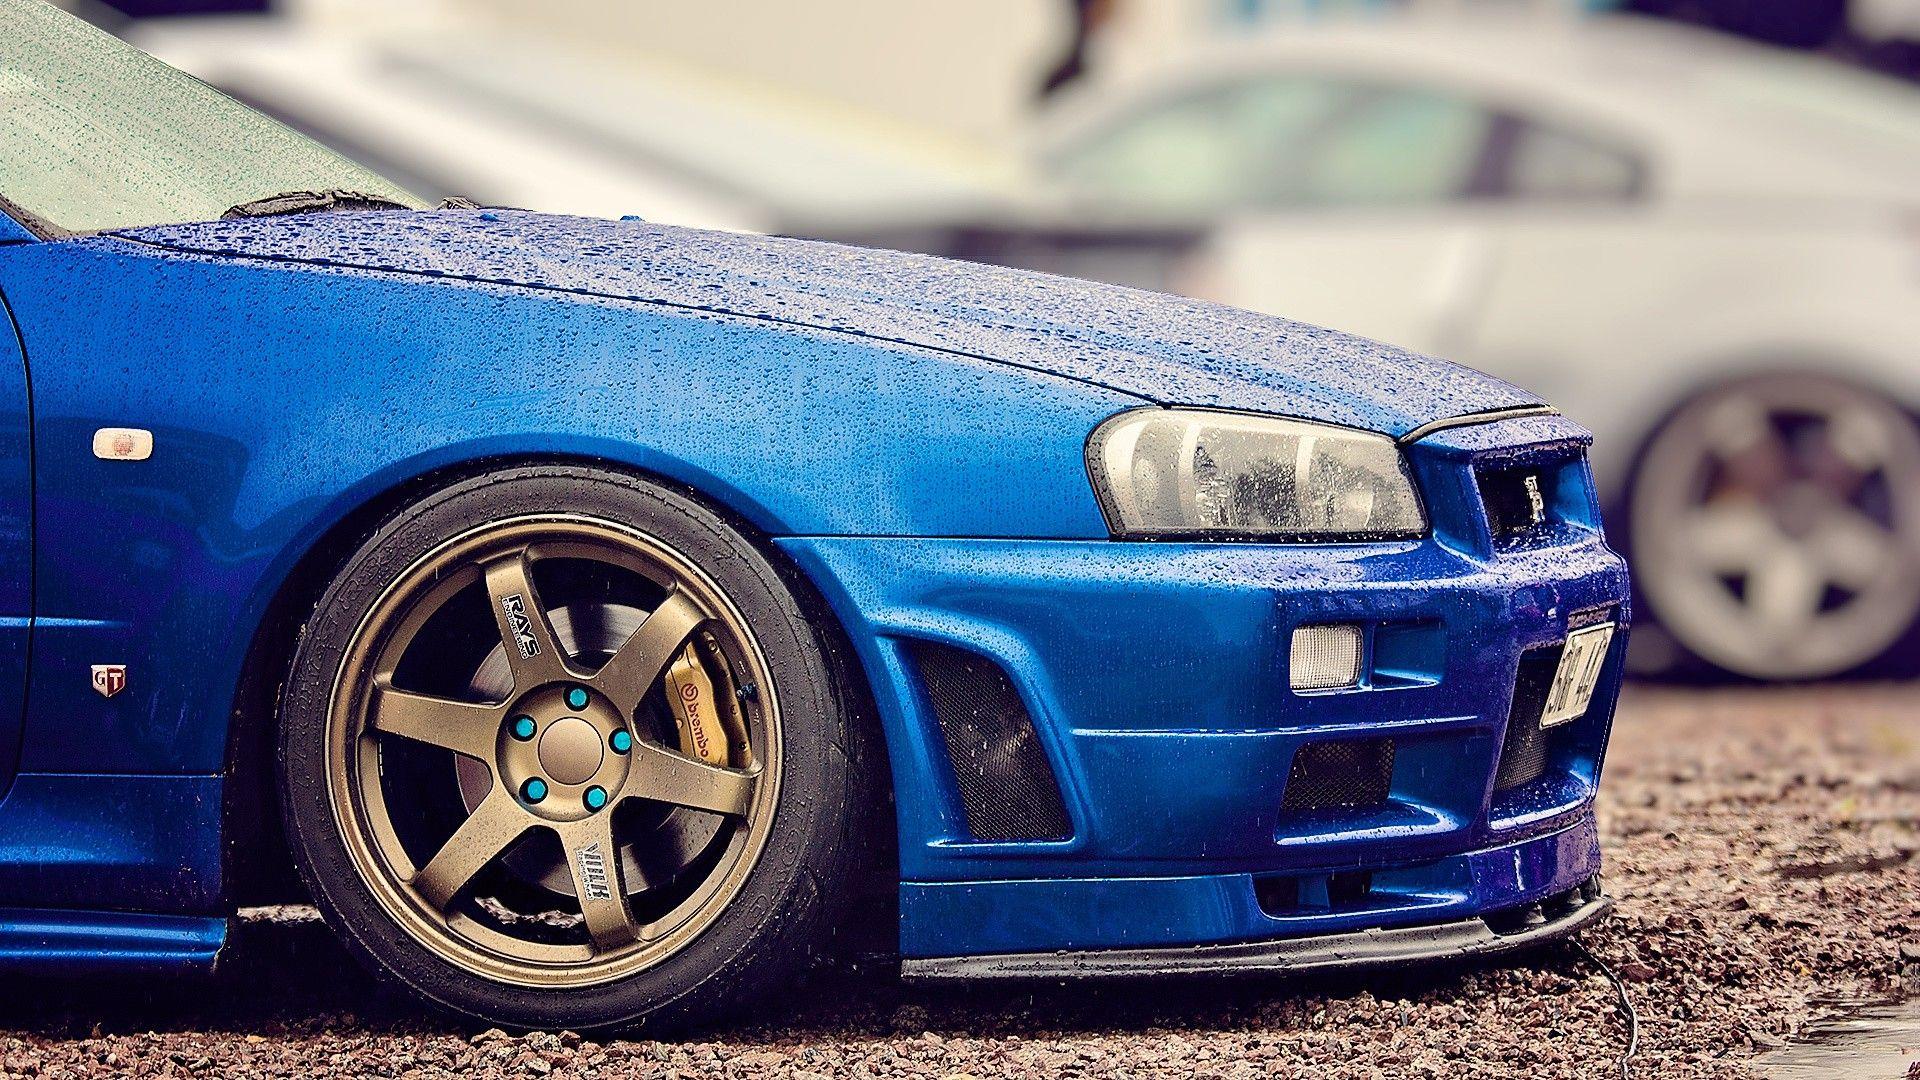 nissan skyline hd wallpapers 1080p cars | sgtr | pinterest | cars